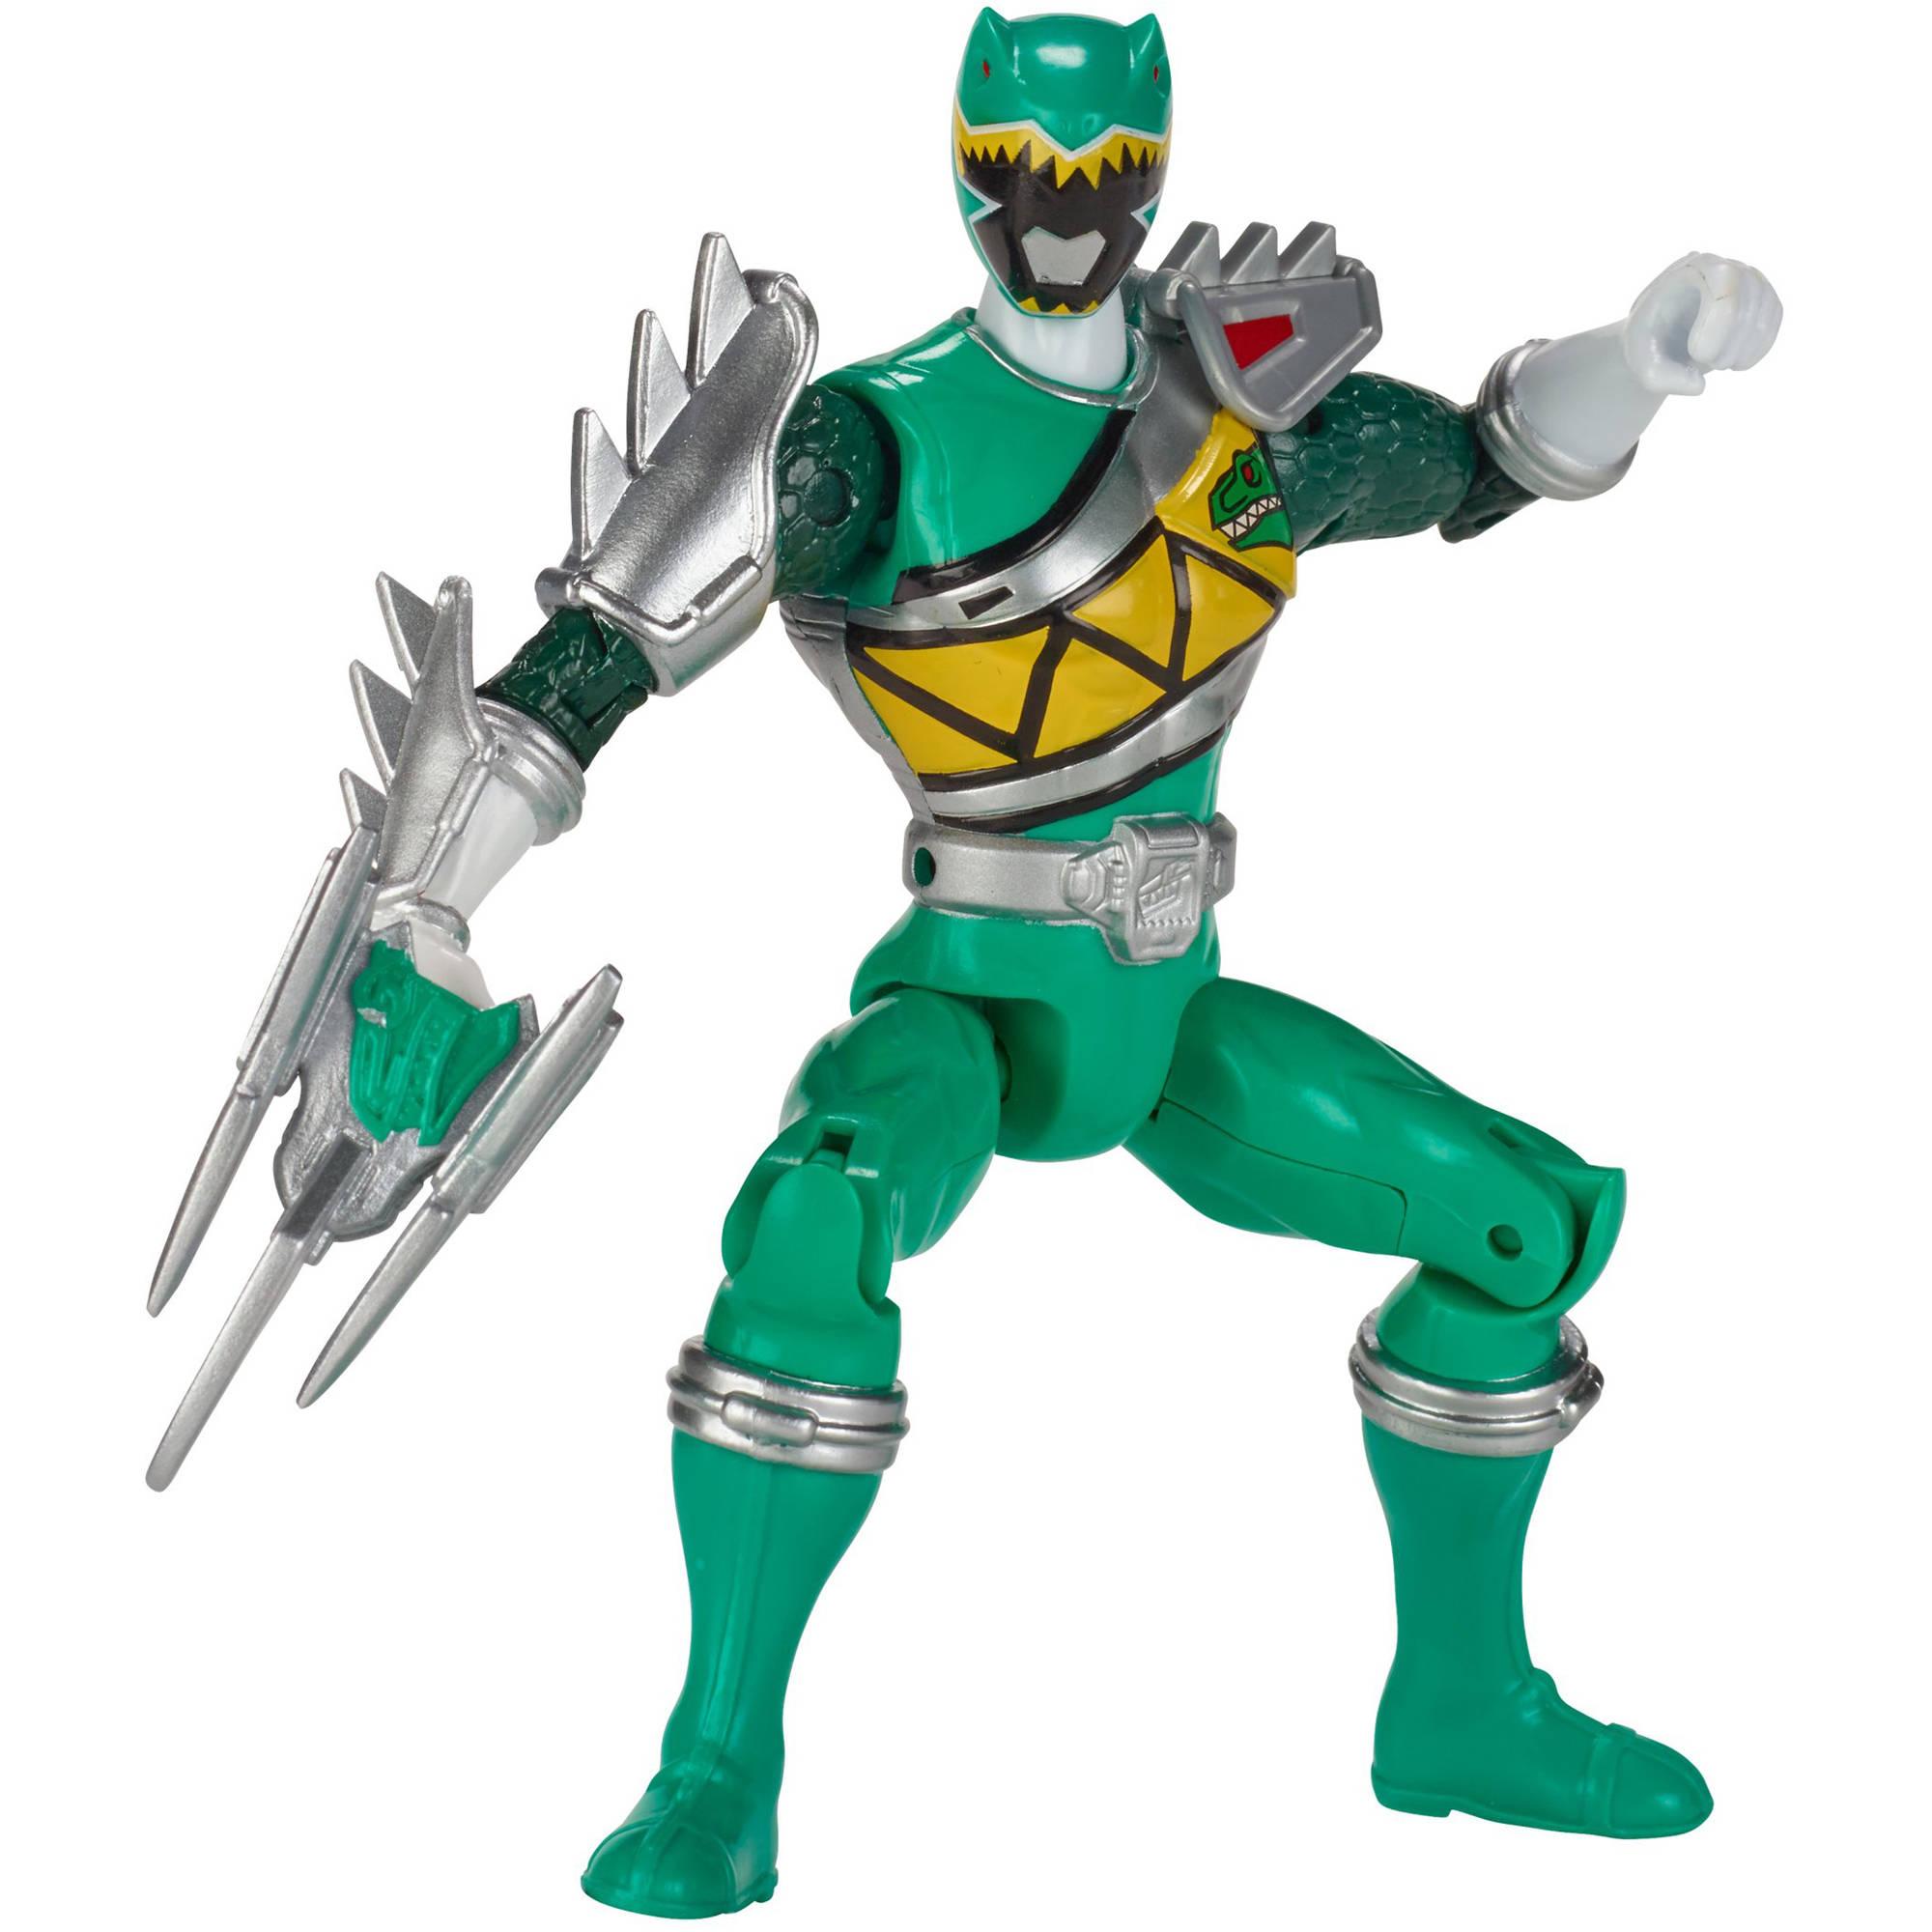 Power Rangers Dino Super Charge Dino Steel Green Ranger